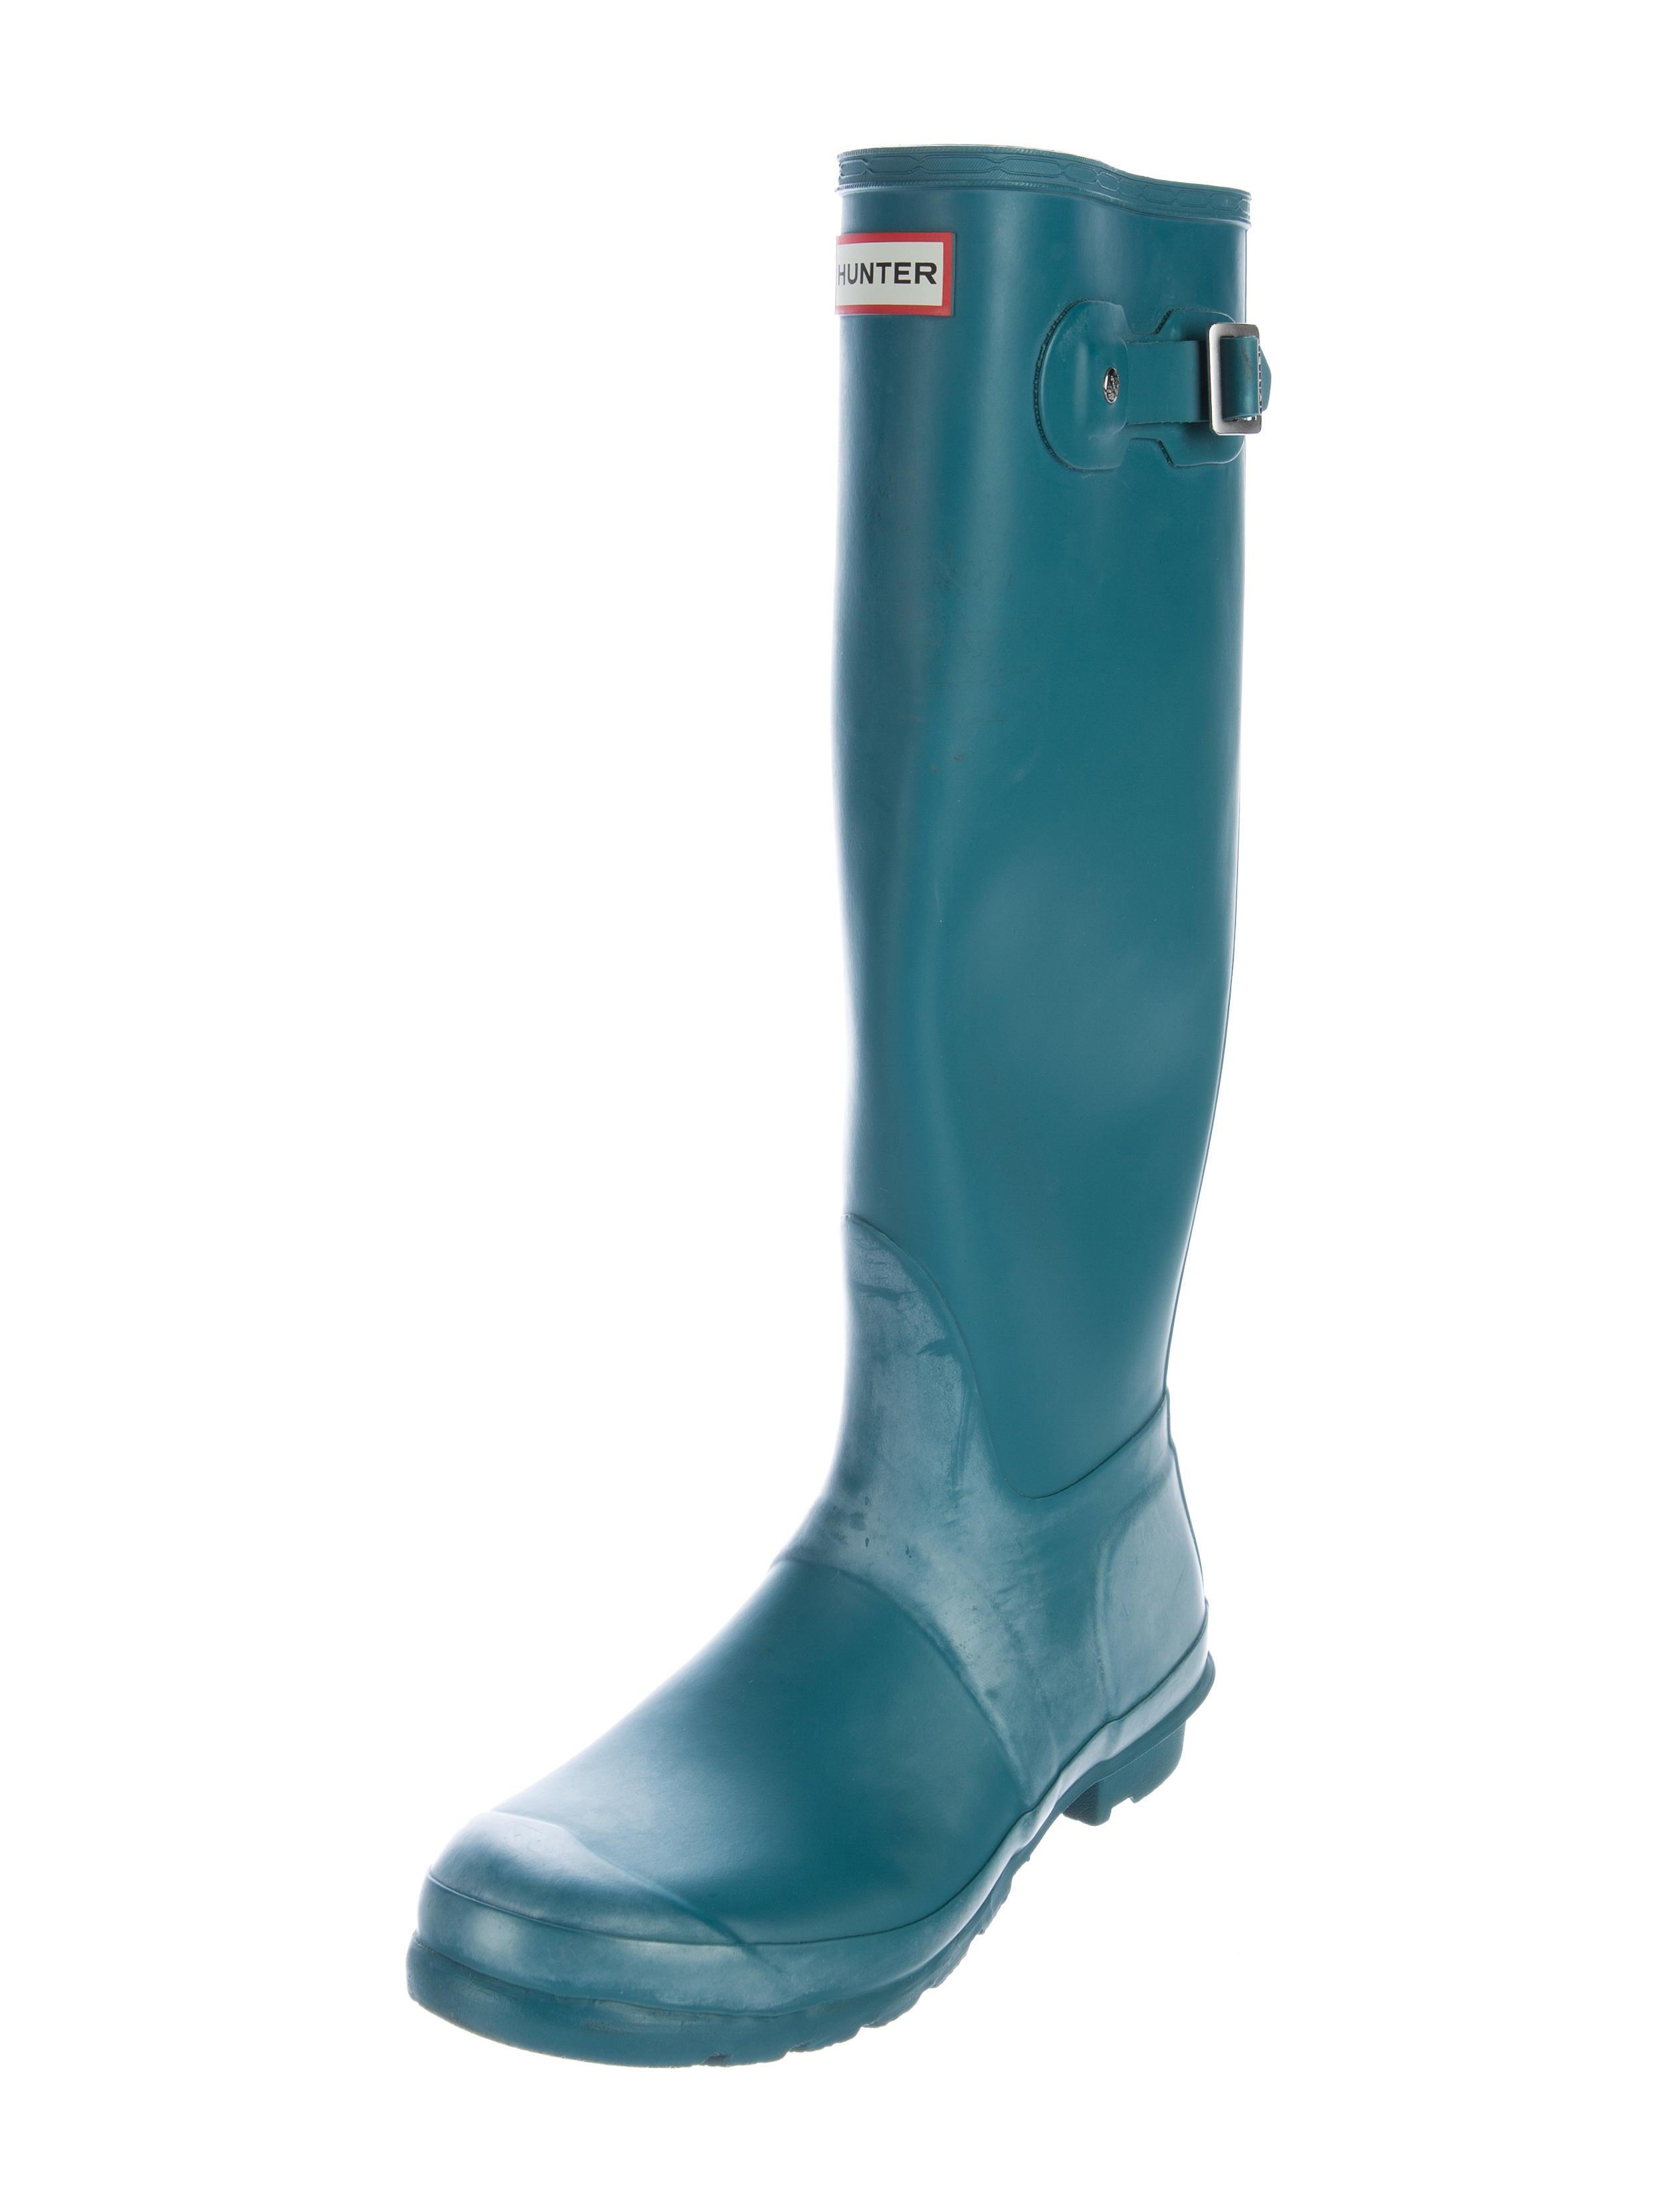 Rubber rain shoe: Target.